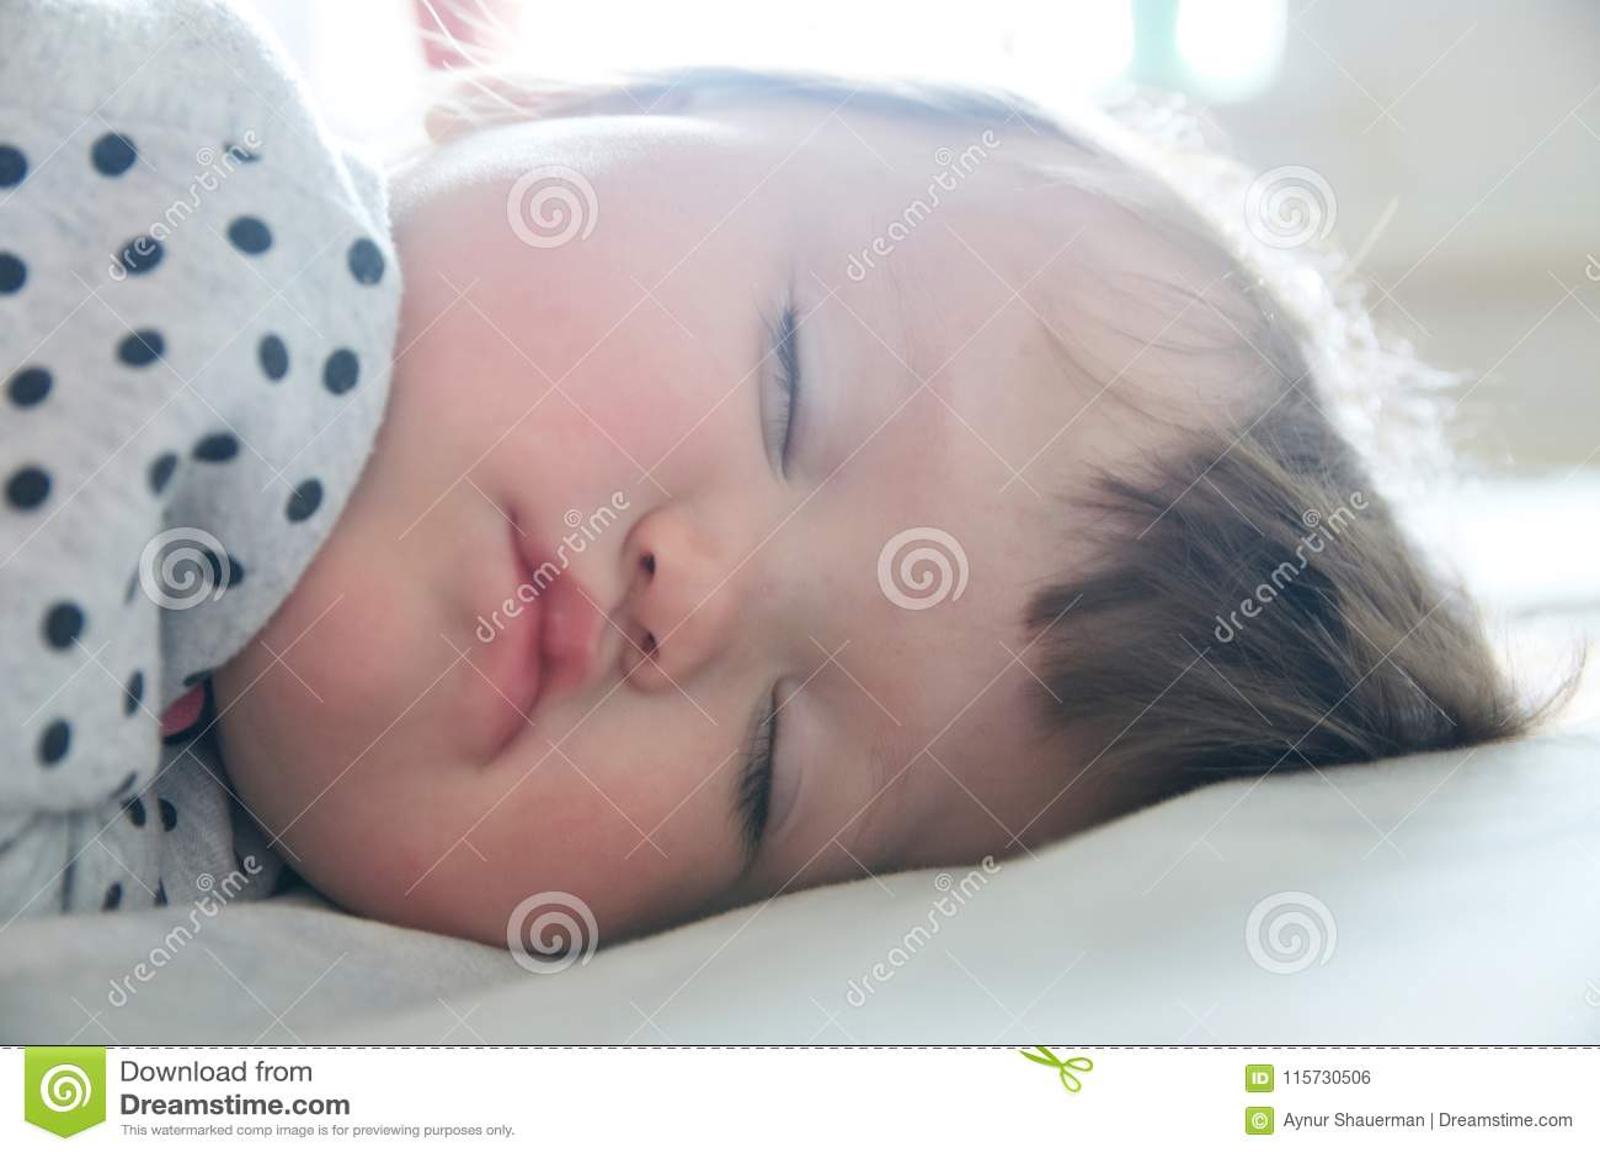 Baby sleeping portrait close up, health care. Little girl sleep cute